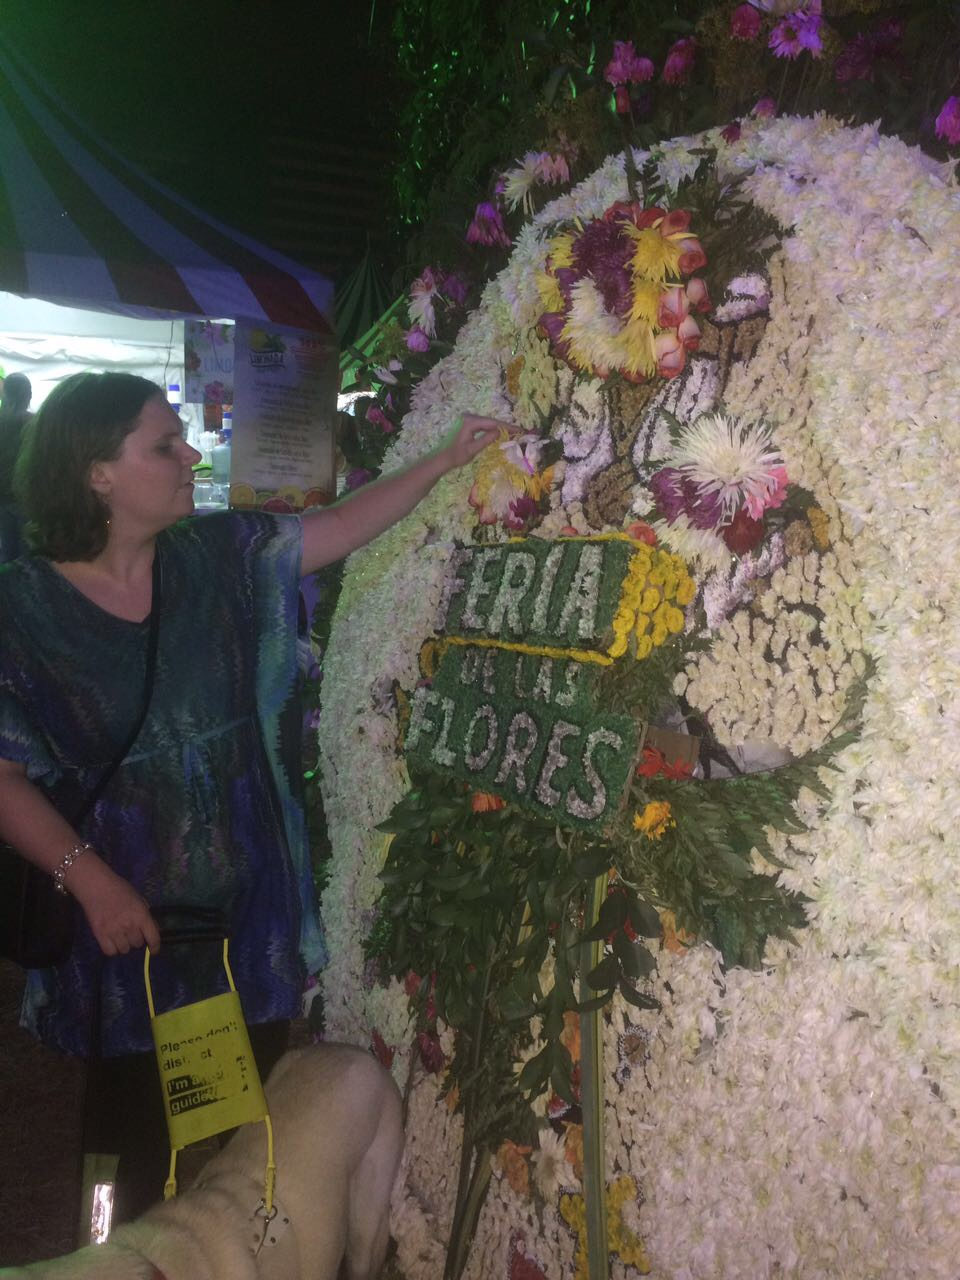 Me at the plaza de las flores in Ciudad del rio. I'm touching a silleta that is taller than me and has a flower design that spells out Feria de las Flores.